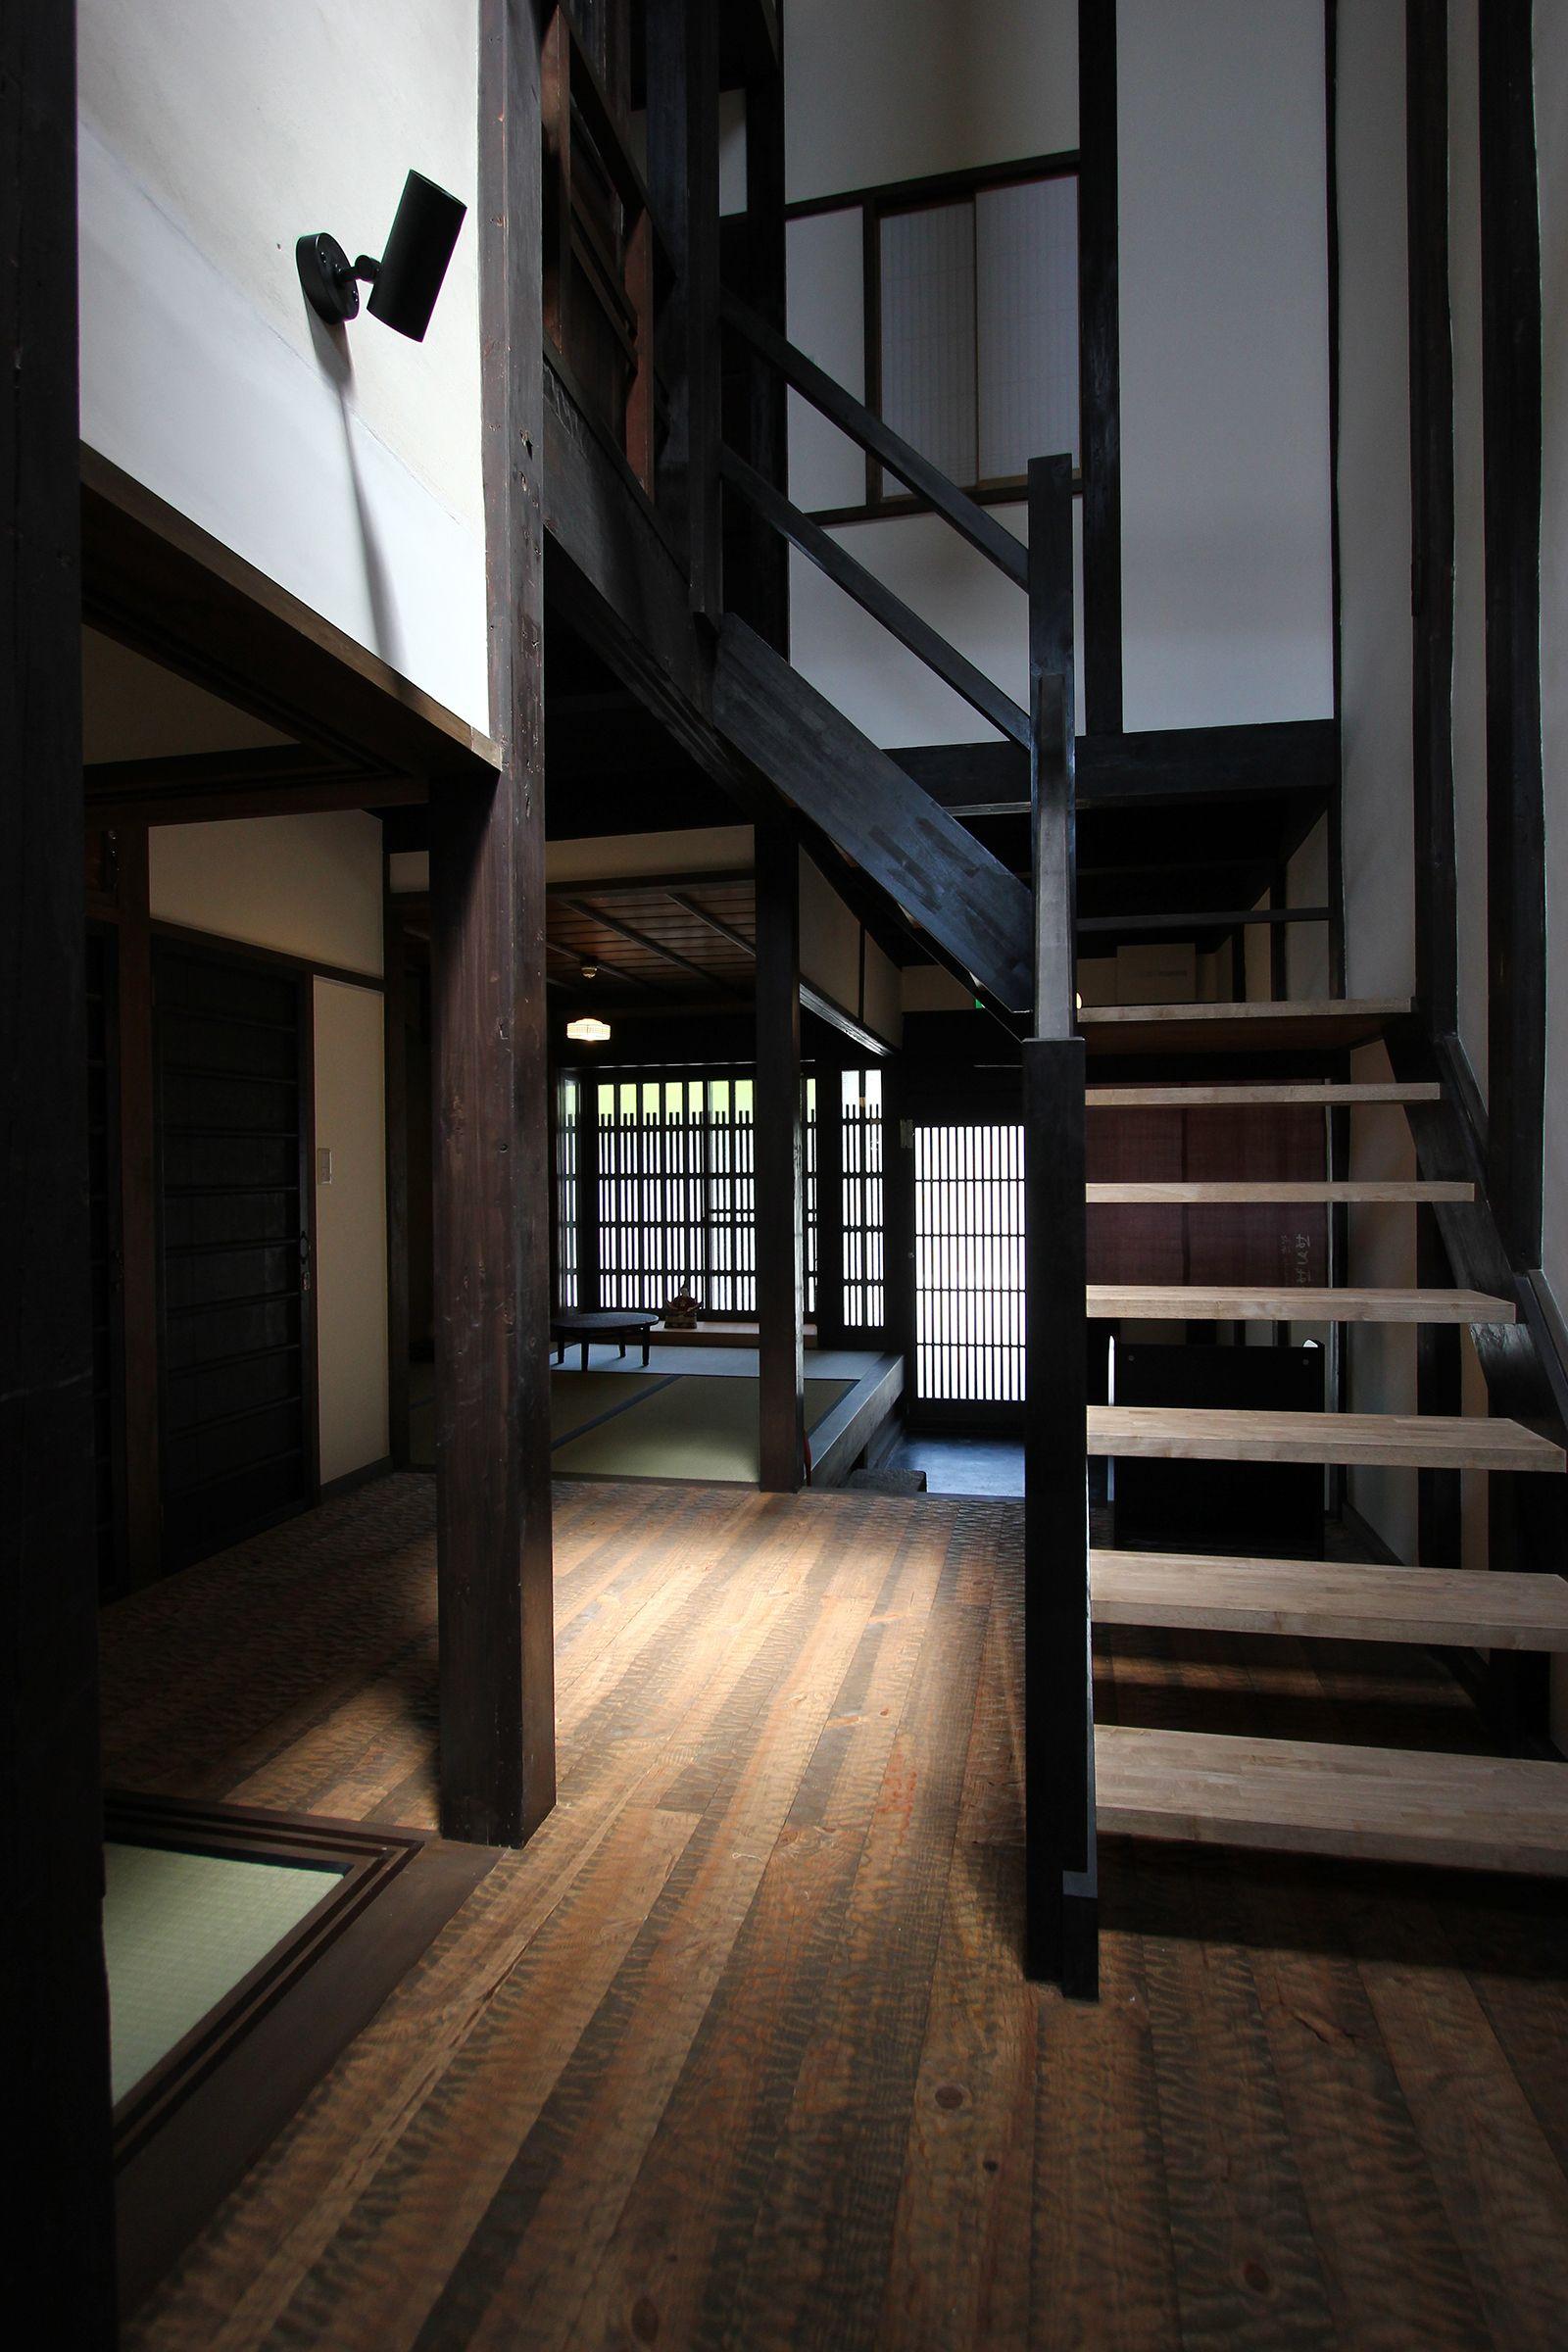 Machiya residence inn kyoto japan - Japanische innenarchitektur ...